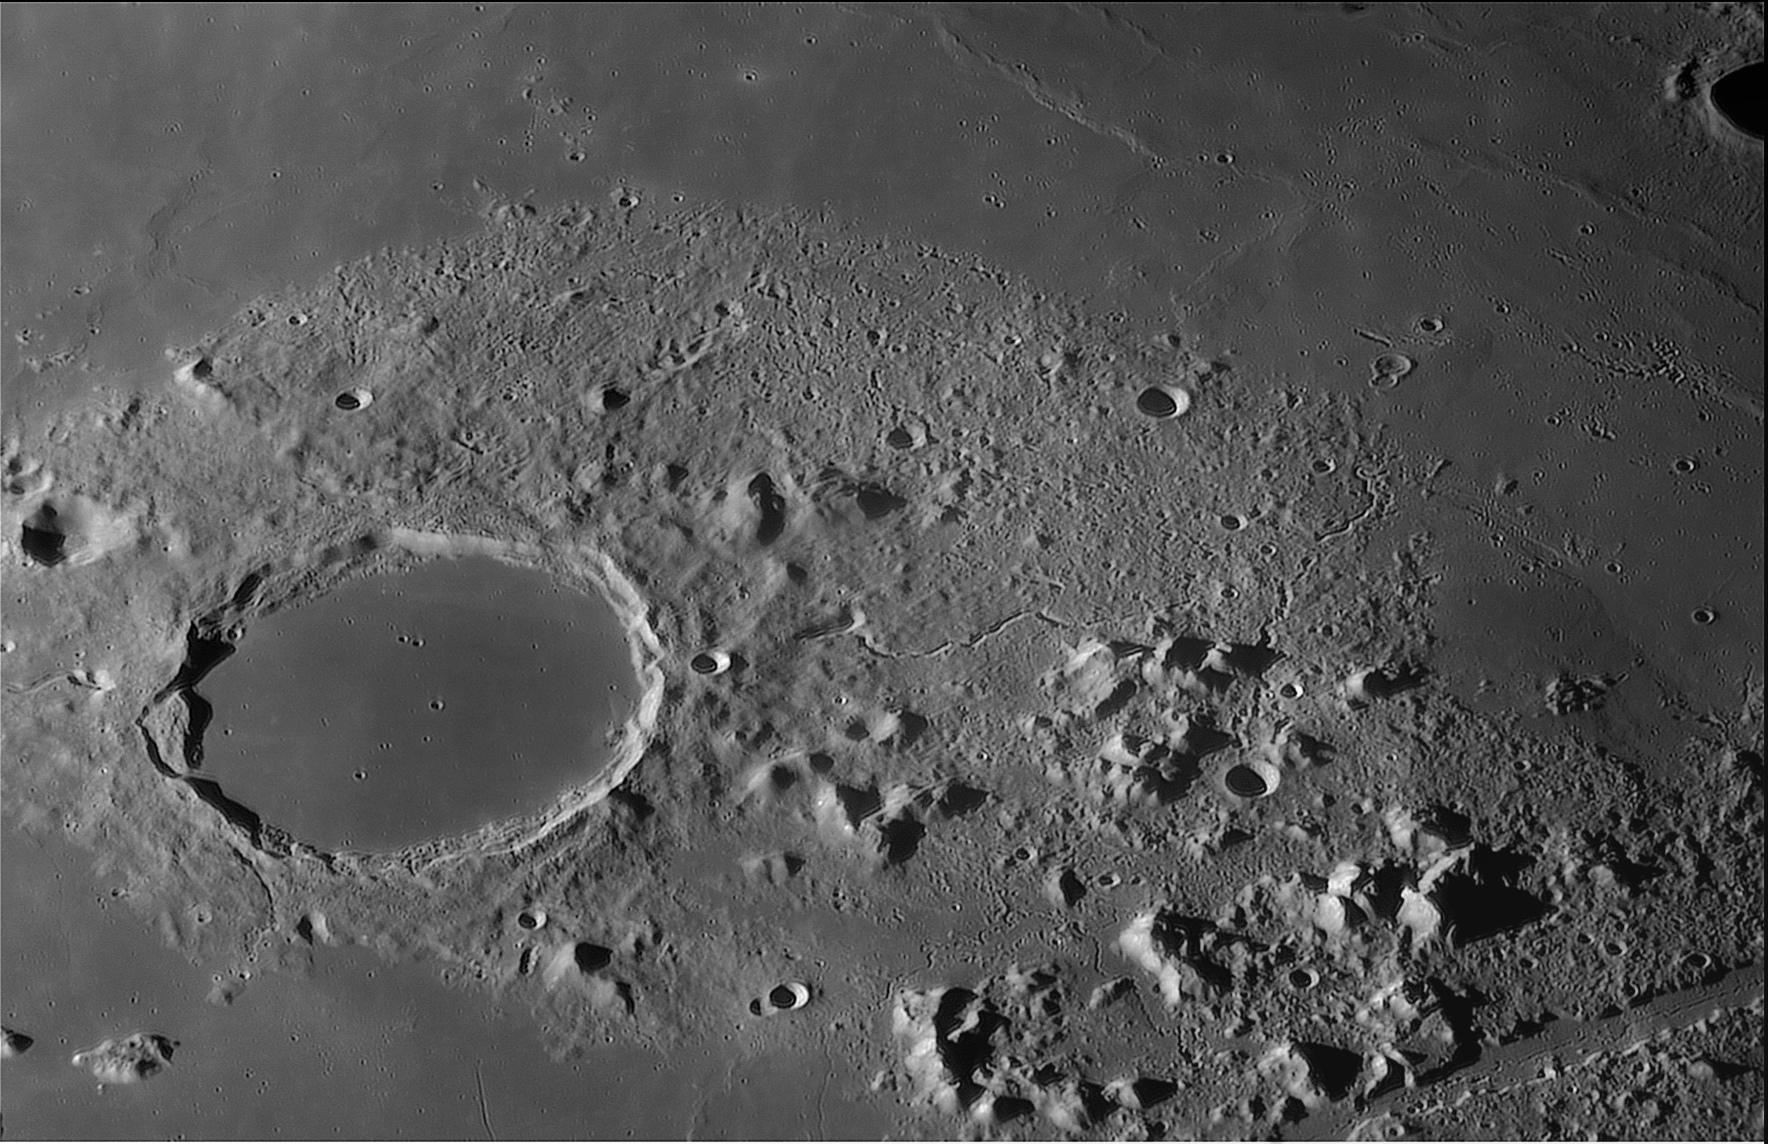 lune__2015-08-06_t_05-24X4f.jpg.07501932907e4969279678062a90493d.jpg